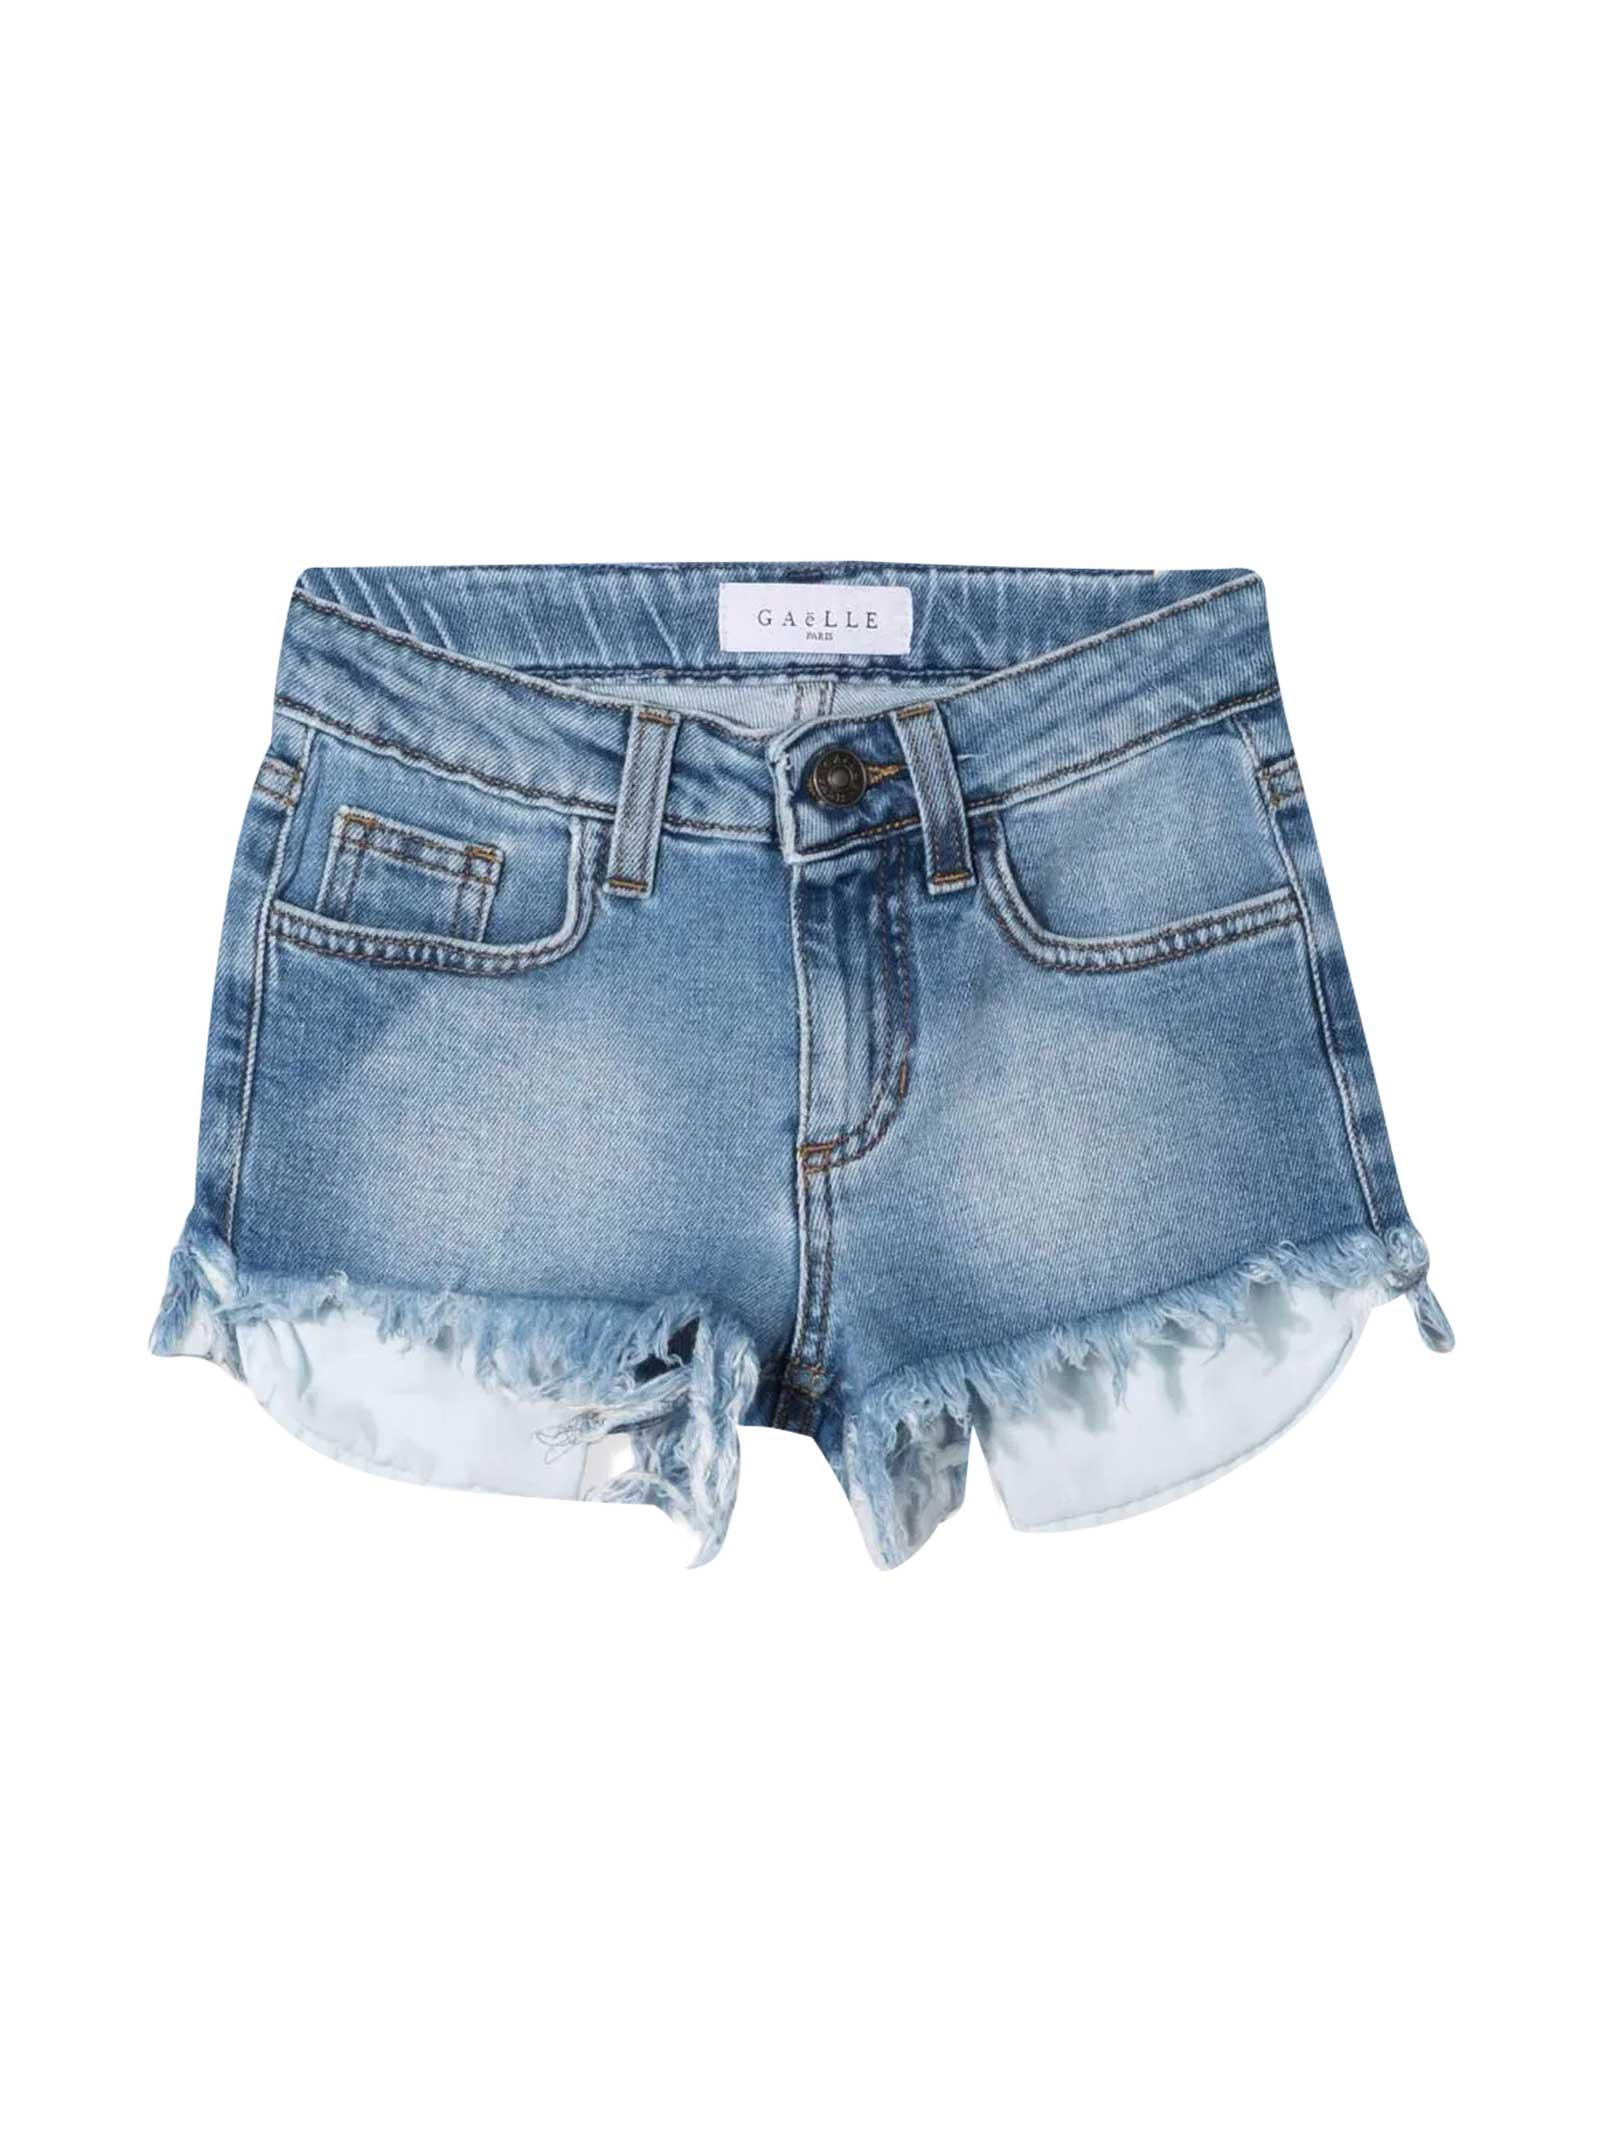 Teen Denim Shorts With Print